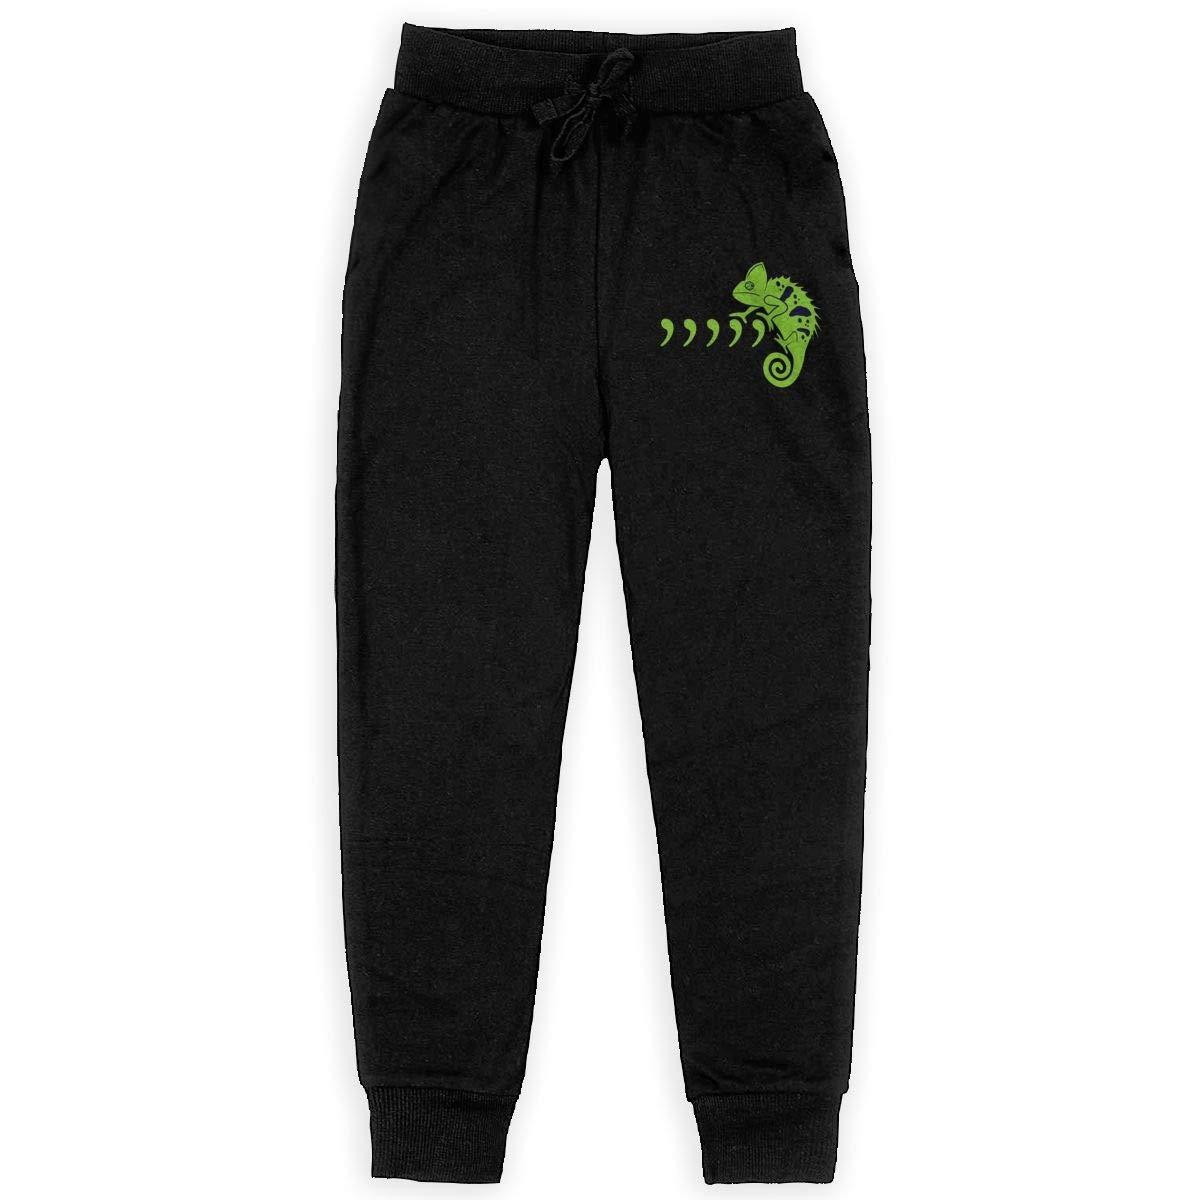 Dunpaiaa Commachameleon Fullpic Artwork Boys Sweatpants,Joggers Sport Training Pants Trousers Black